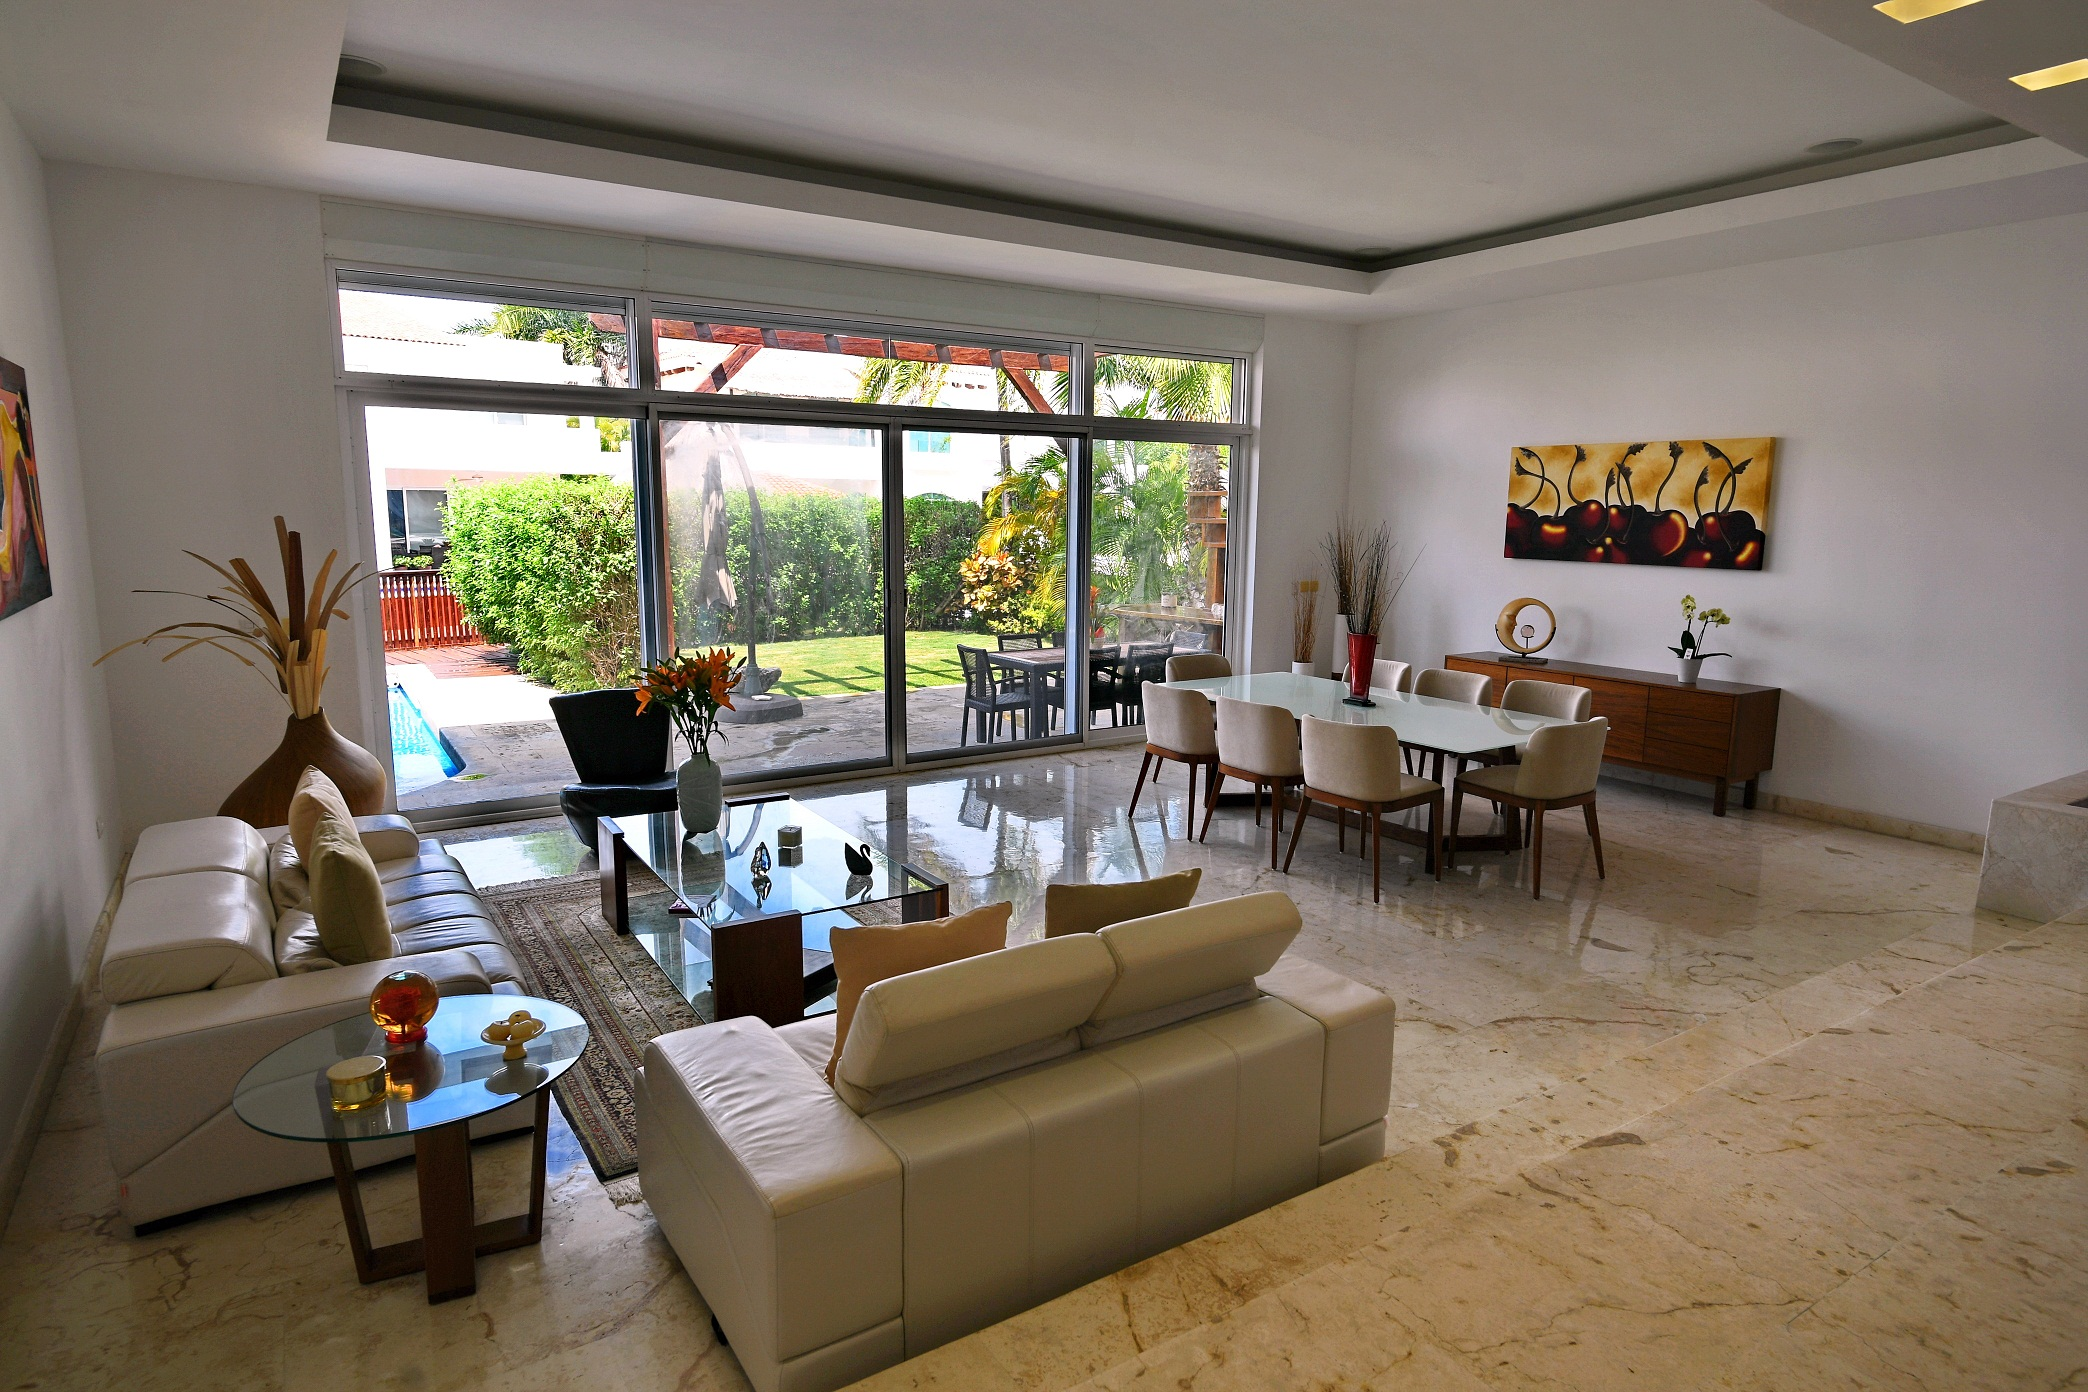 Residencia en Venta 4 recámaras, 6.5 baños, Isla Dorada Zona Hotelera Cancún